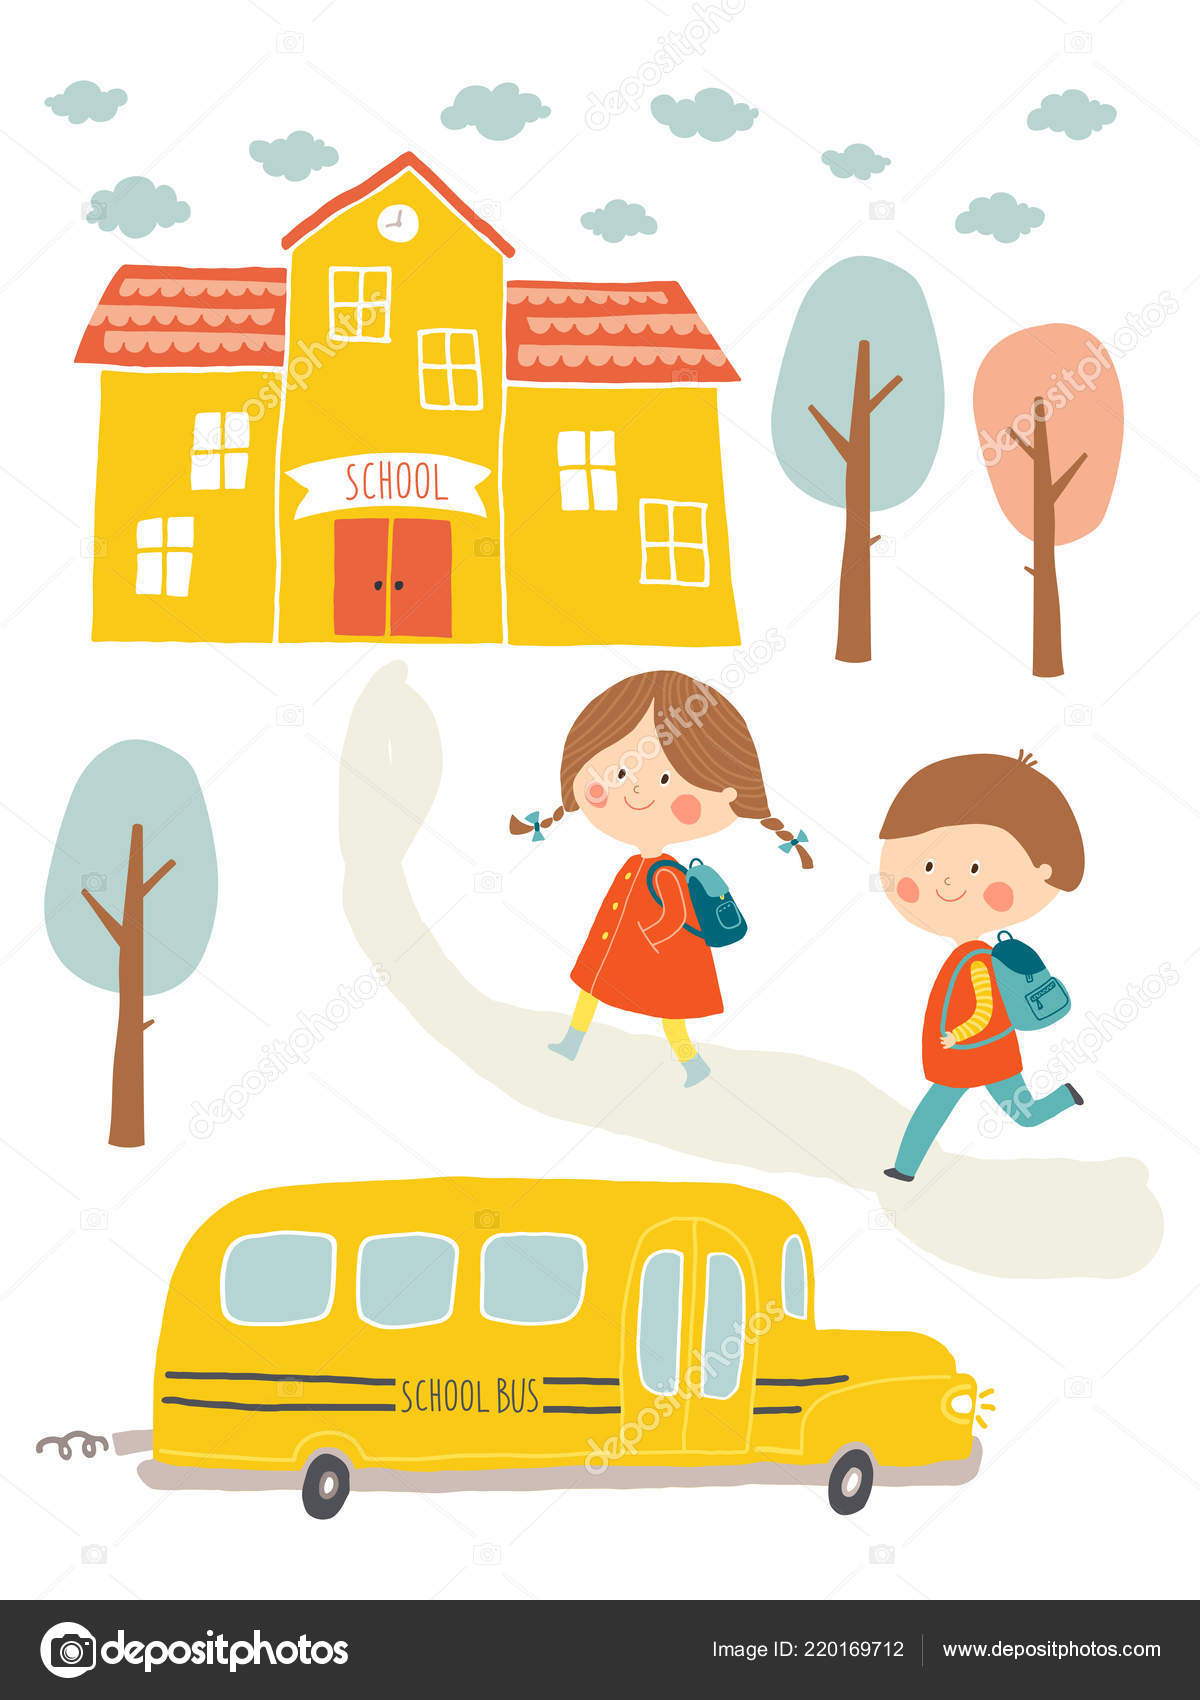 f6e4be2c9f Χαριτωμένο αγόρι και κορίτσι με σχολικό κτίριο και σχολικό λεωφορείο.  Γελοιογραφία clip art eps 10 εικονογράφηση φορέα σε άσπρο φόντο.